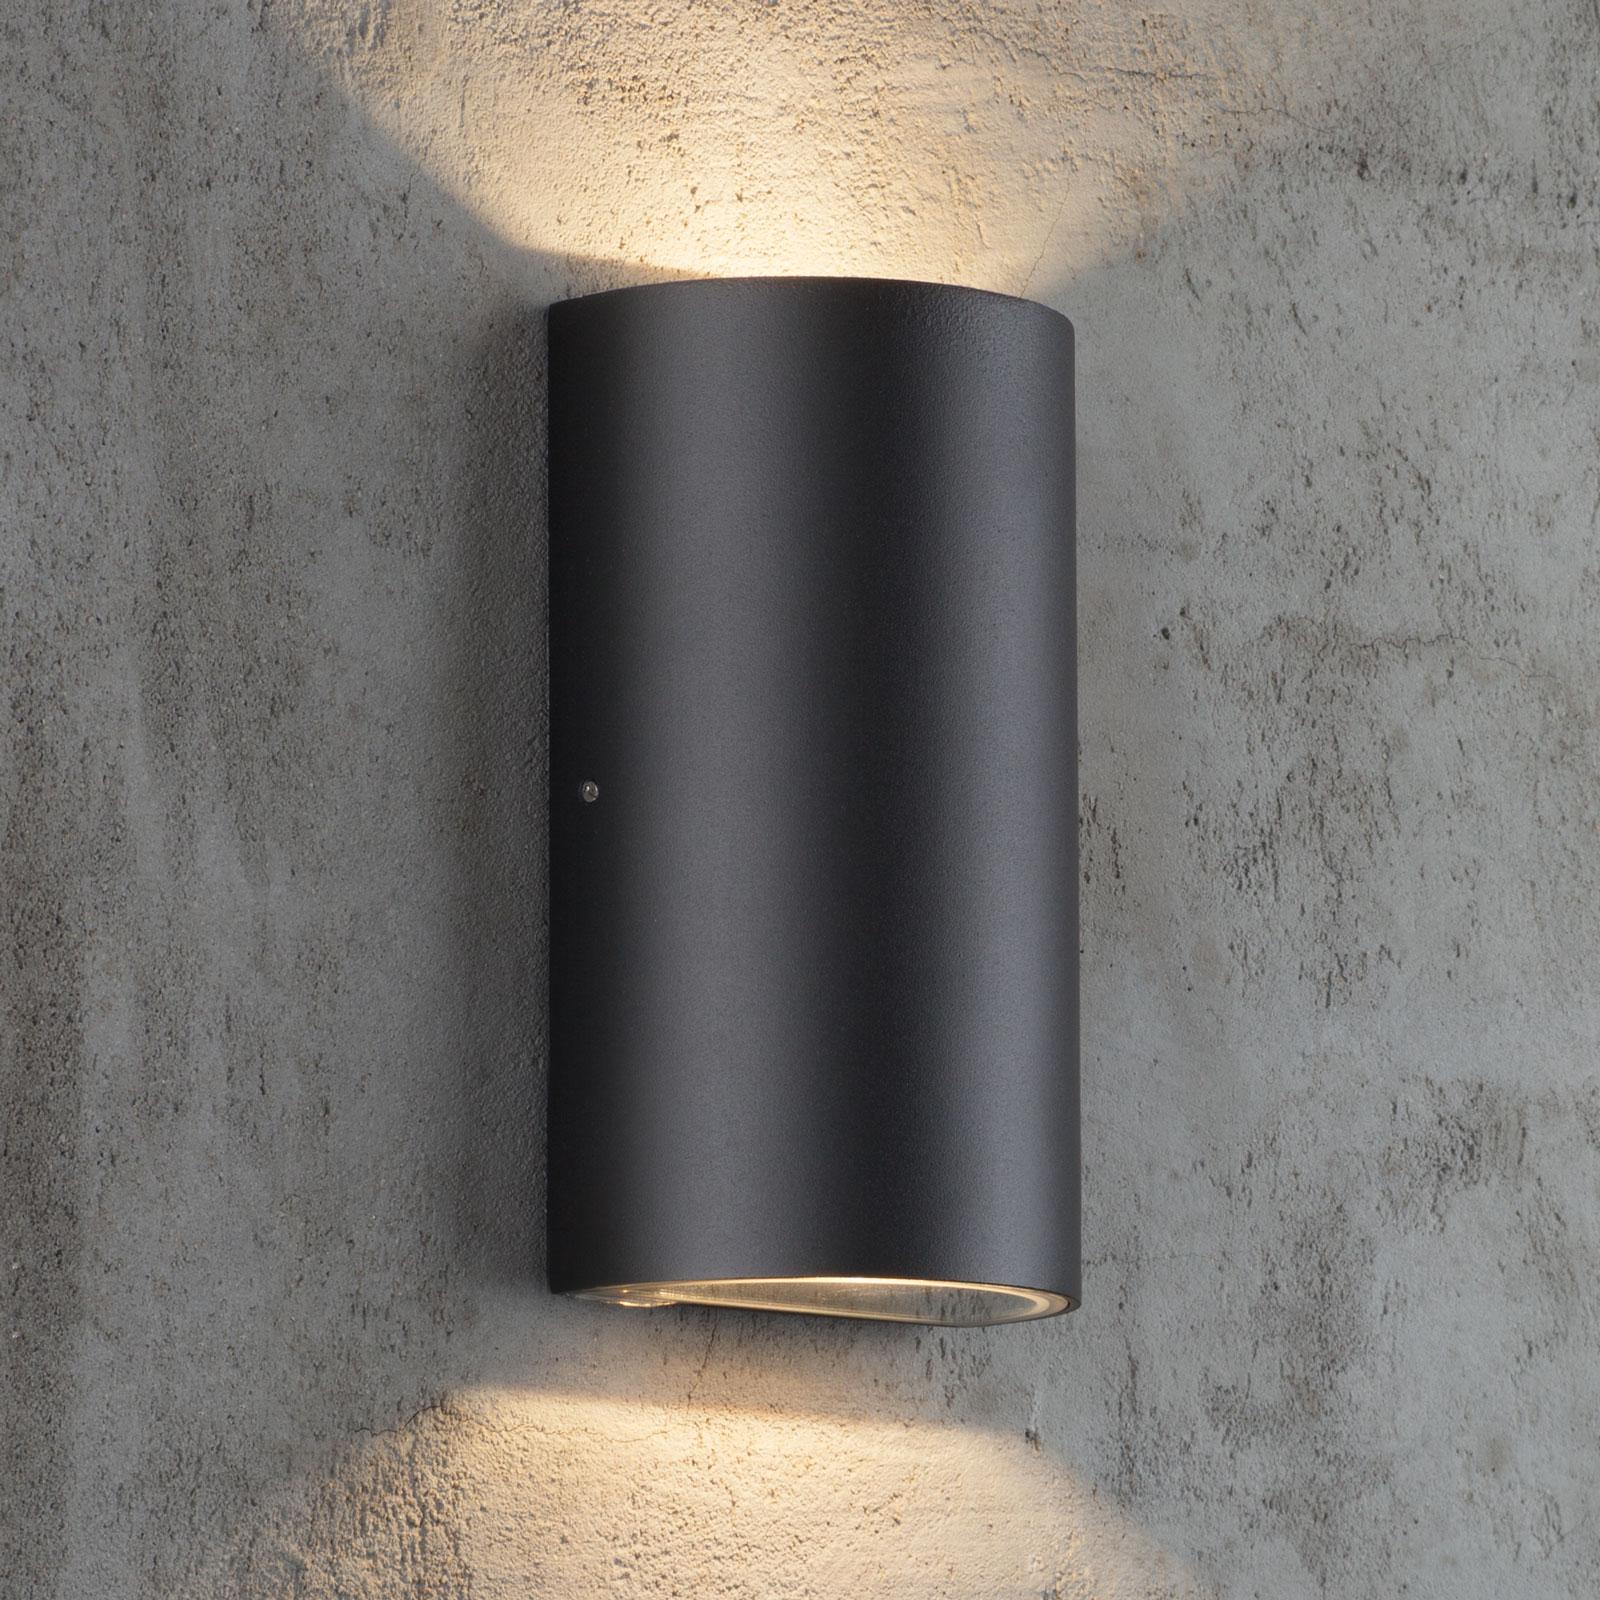 Applique LED da esterni Rold, forma rotonda